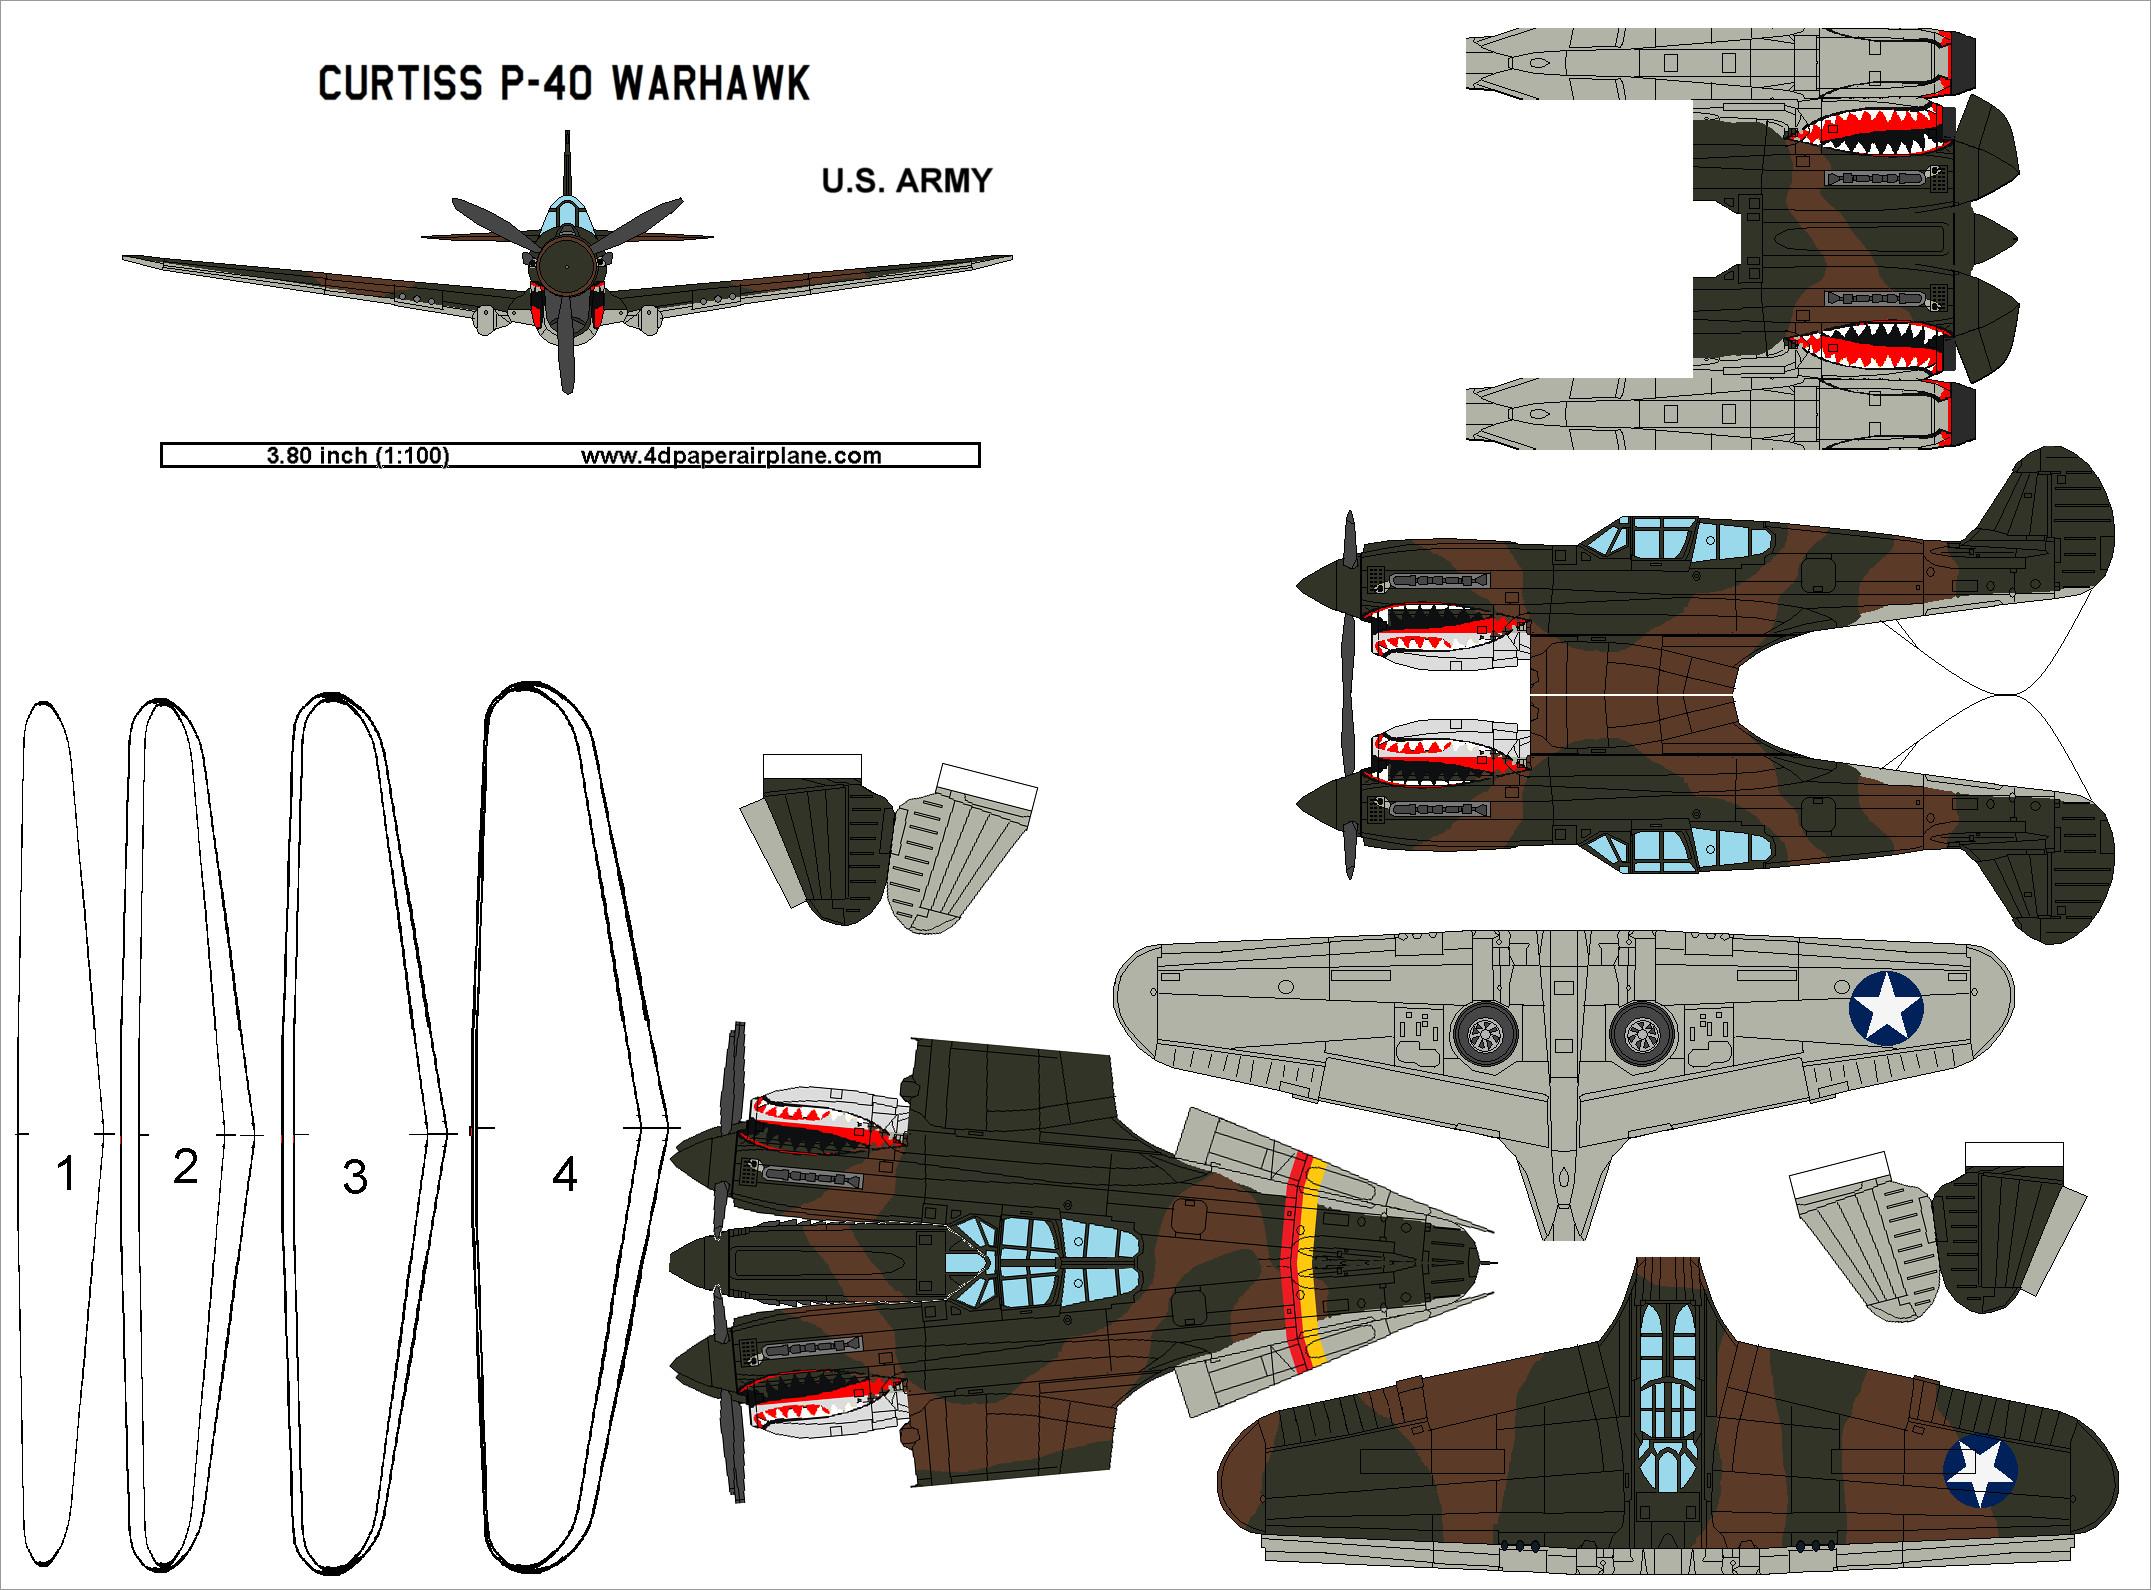 Plane Papercraft Us Army Curtiss P 40 Warhawk Plane Papercraft